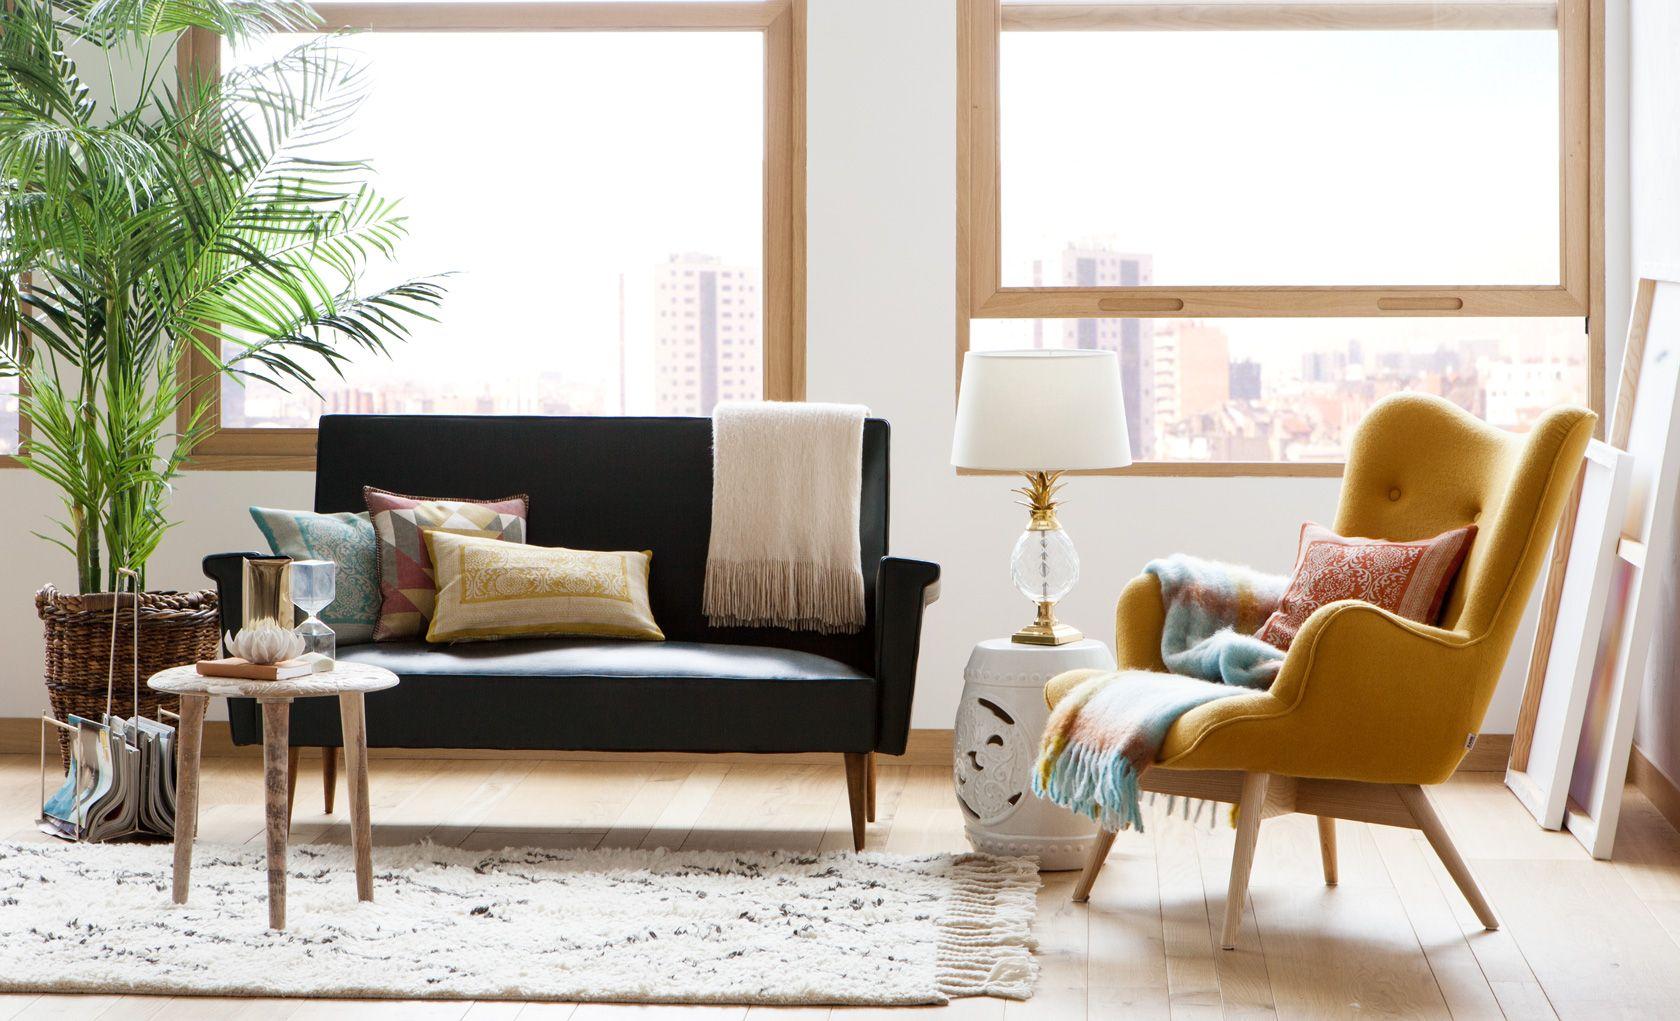 Zara Livingrooms Lookbook Zara Home Interiors Home Home